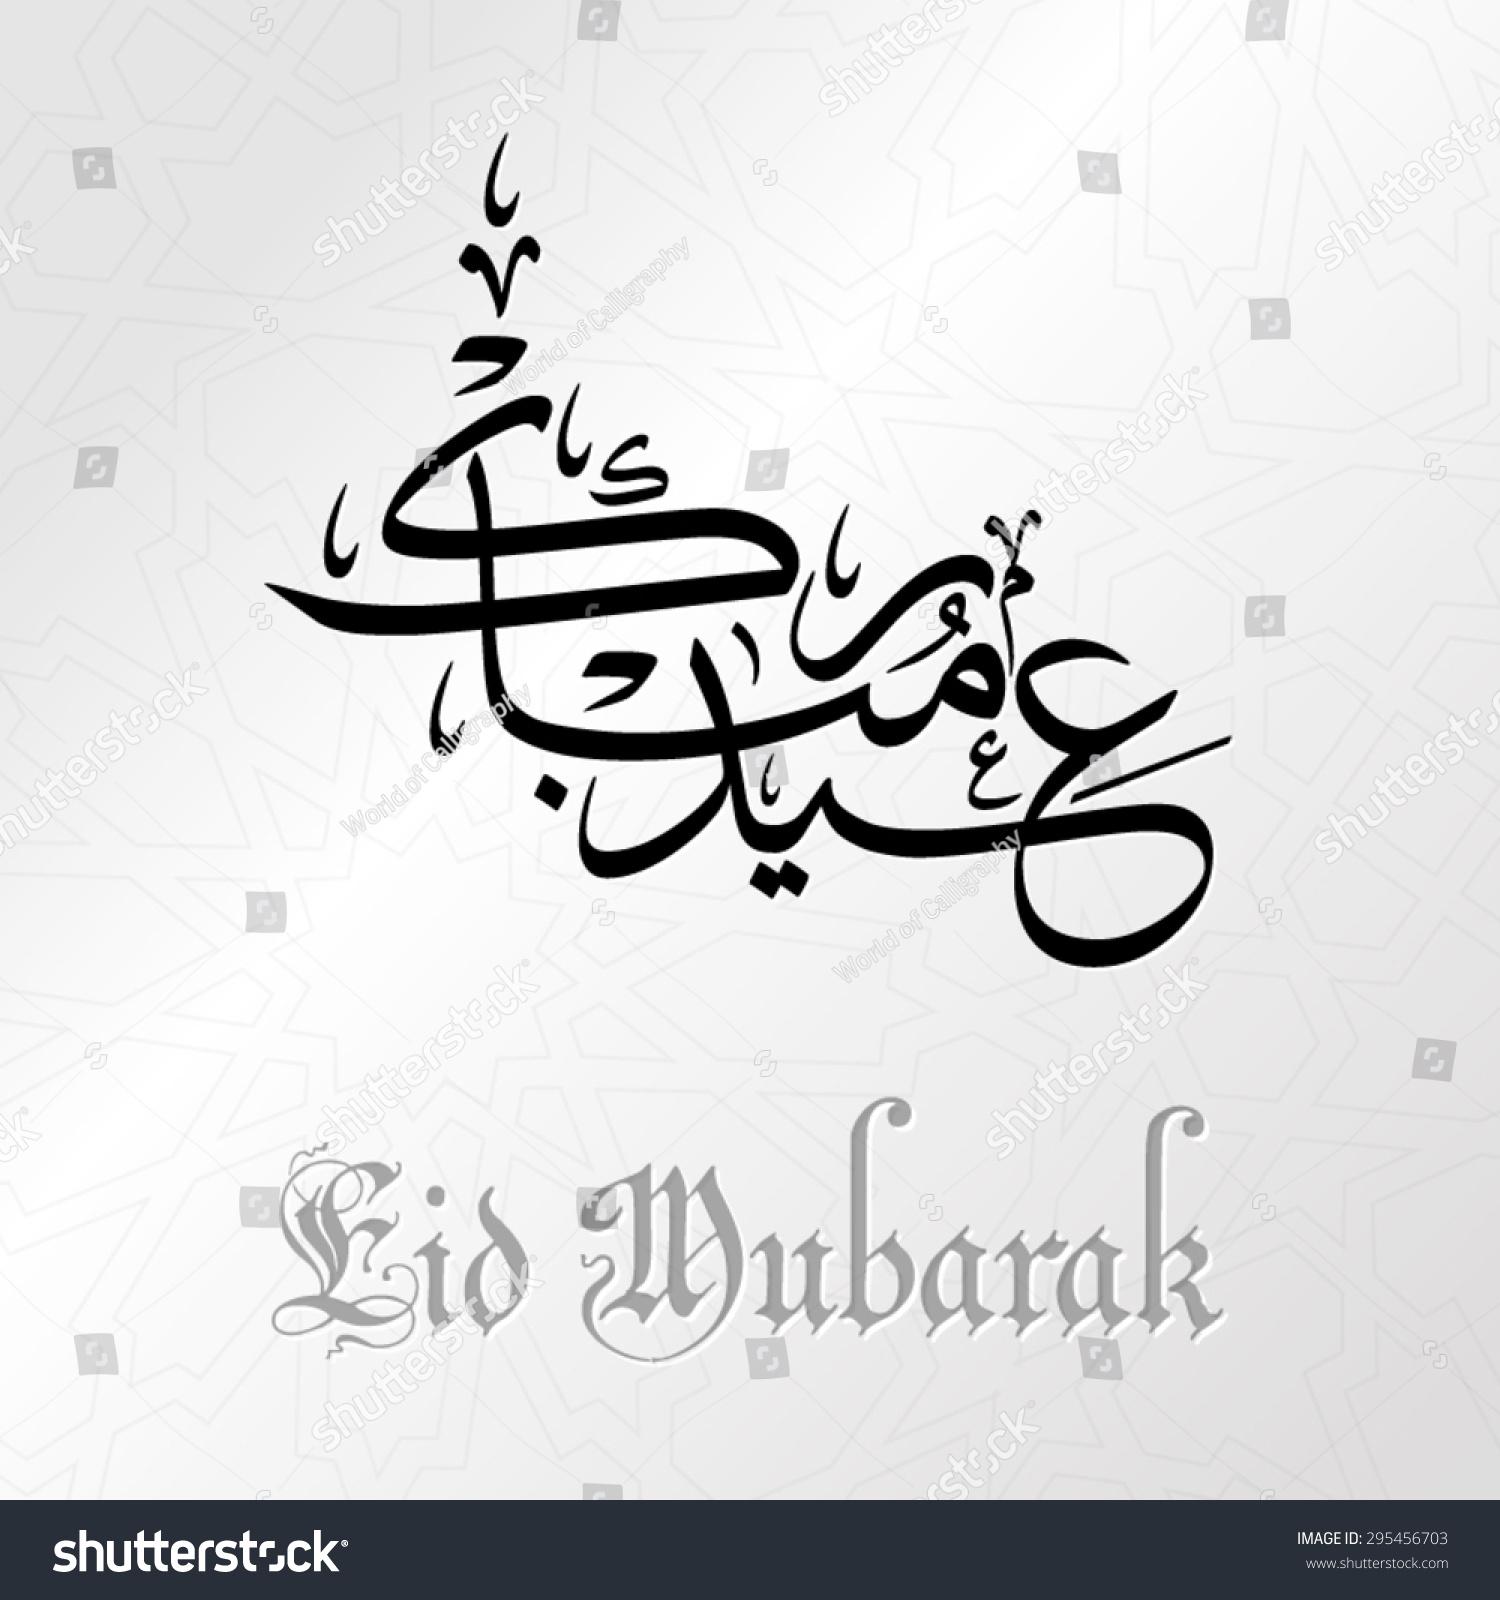 Eid Mubarak Wishes Word Arabic Calligraphy Stock Vector Royalty